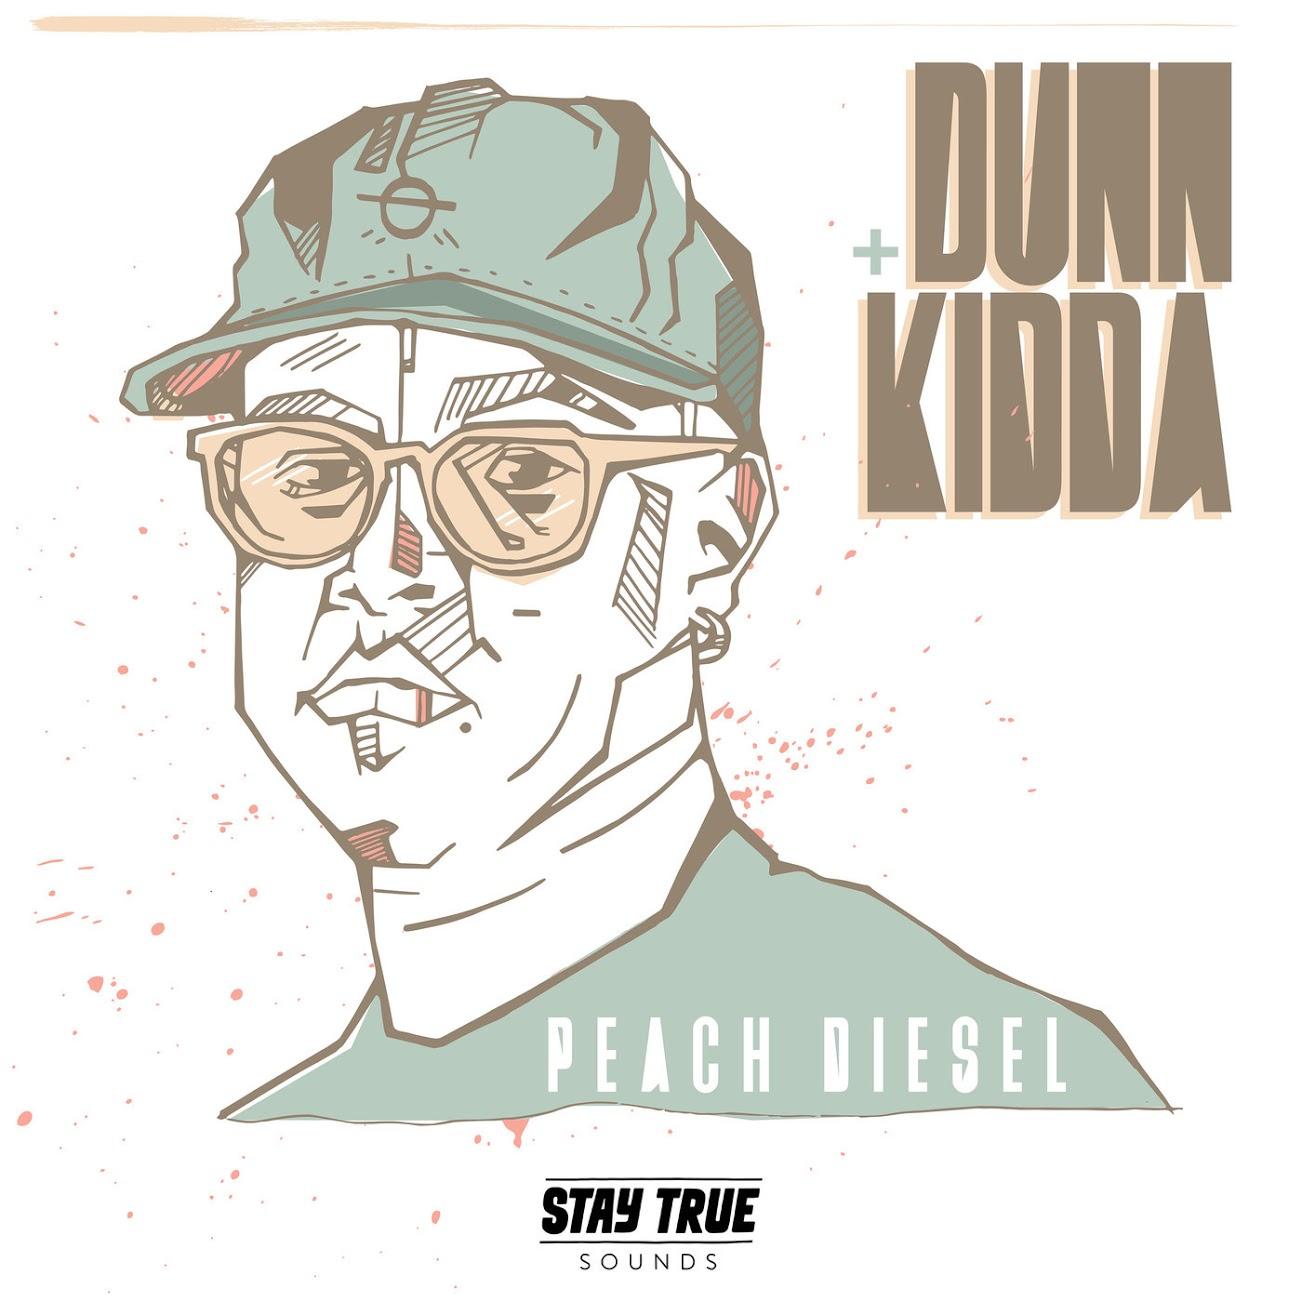 Dunn Kidda Peach Diesel - EP:Dunn Kidda – Peach Diesel